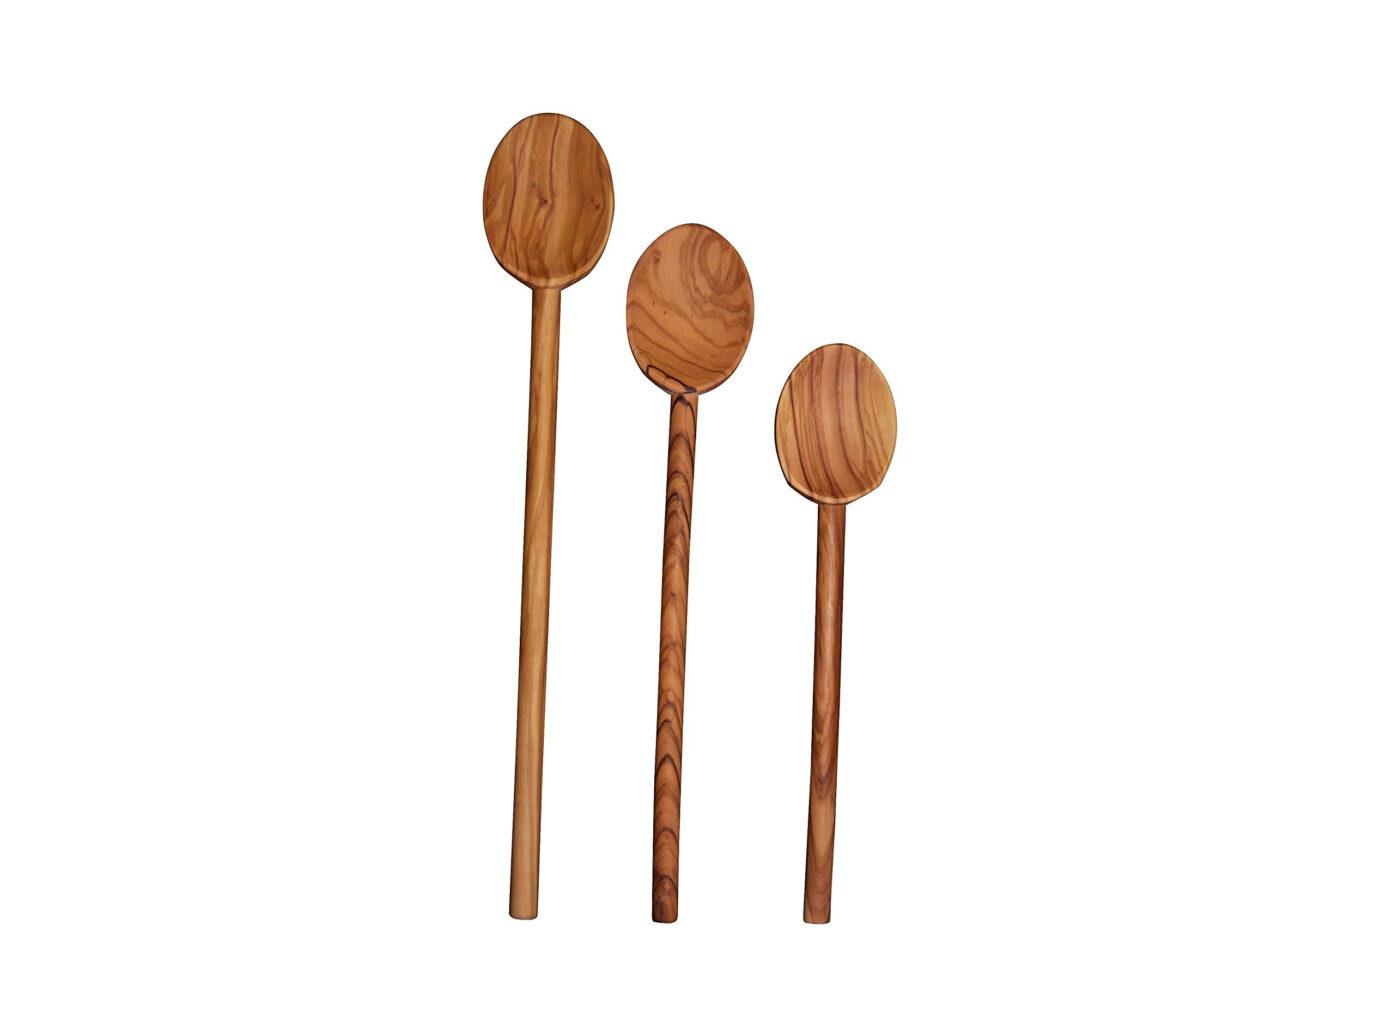 Scanwood Olive Wood Cooking Spoon Set